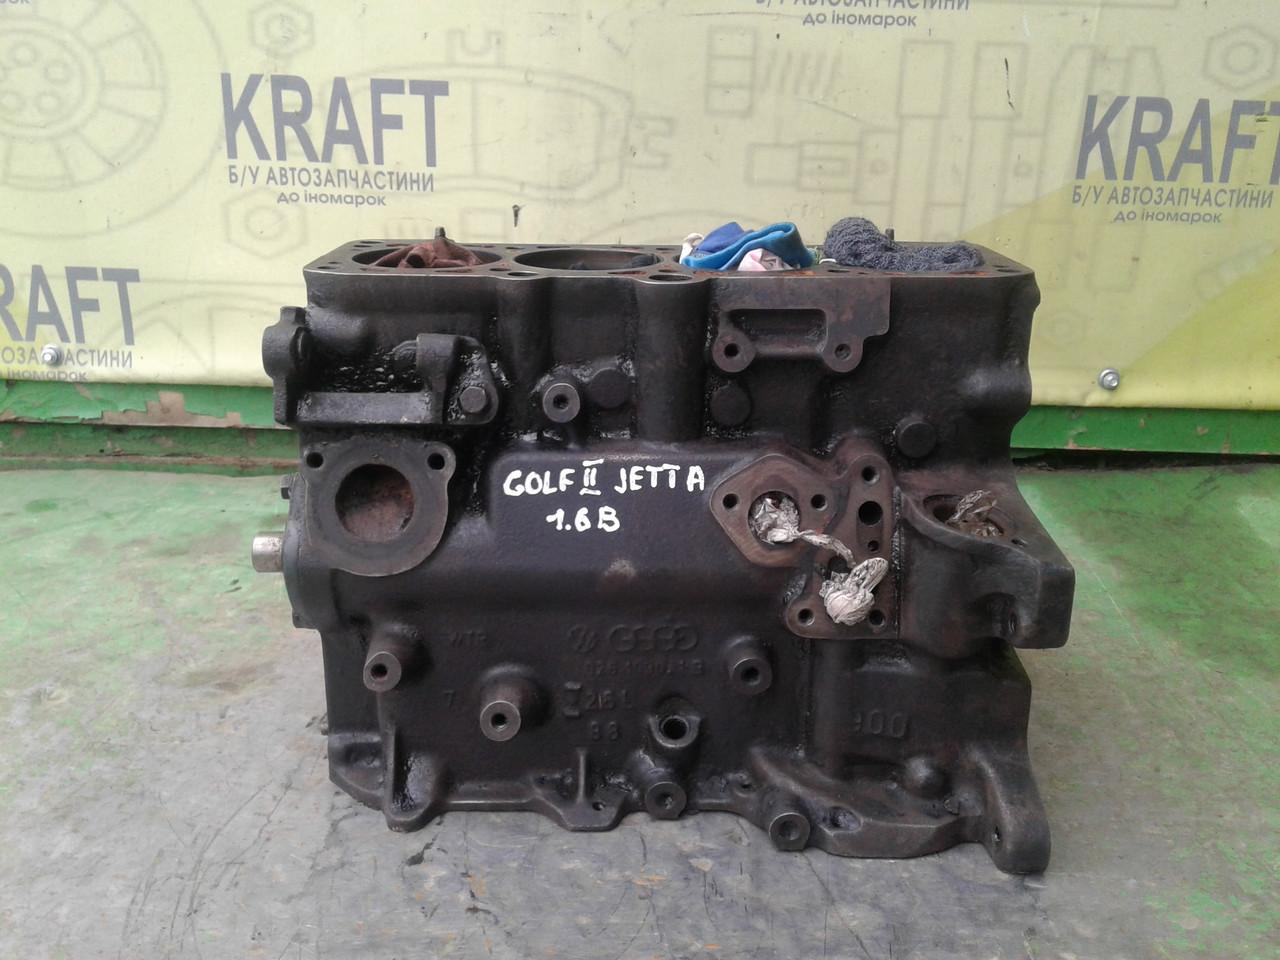 Бо блок двигуна для Volkswagen Golf II, Jetta 1.6 B, 026 103 021 B